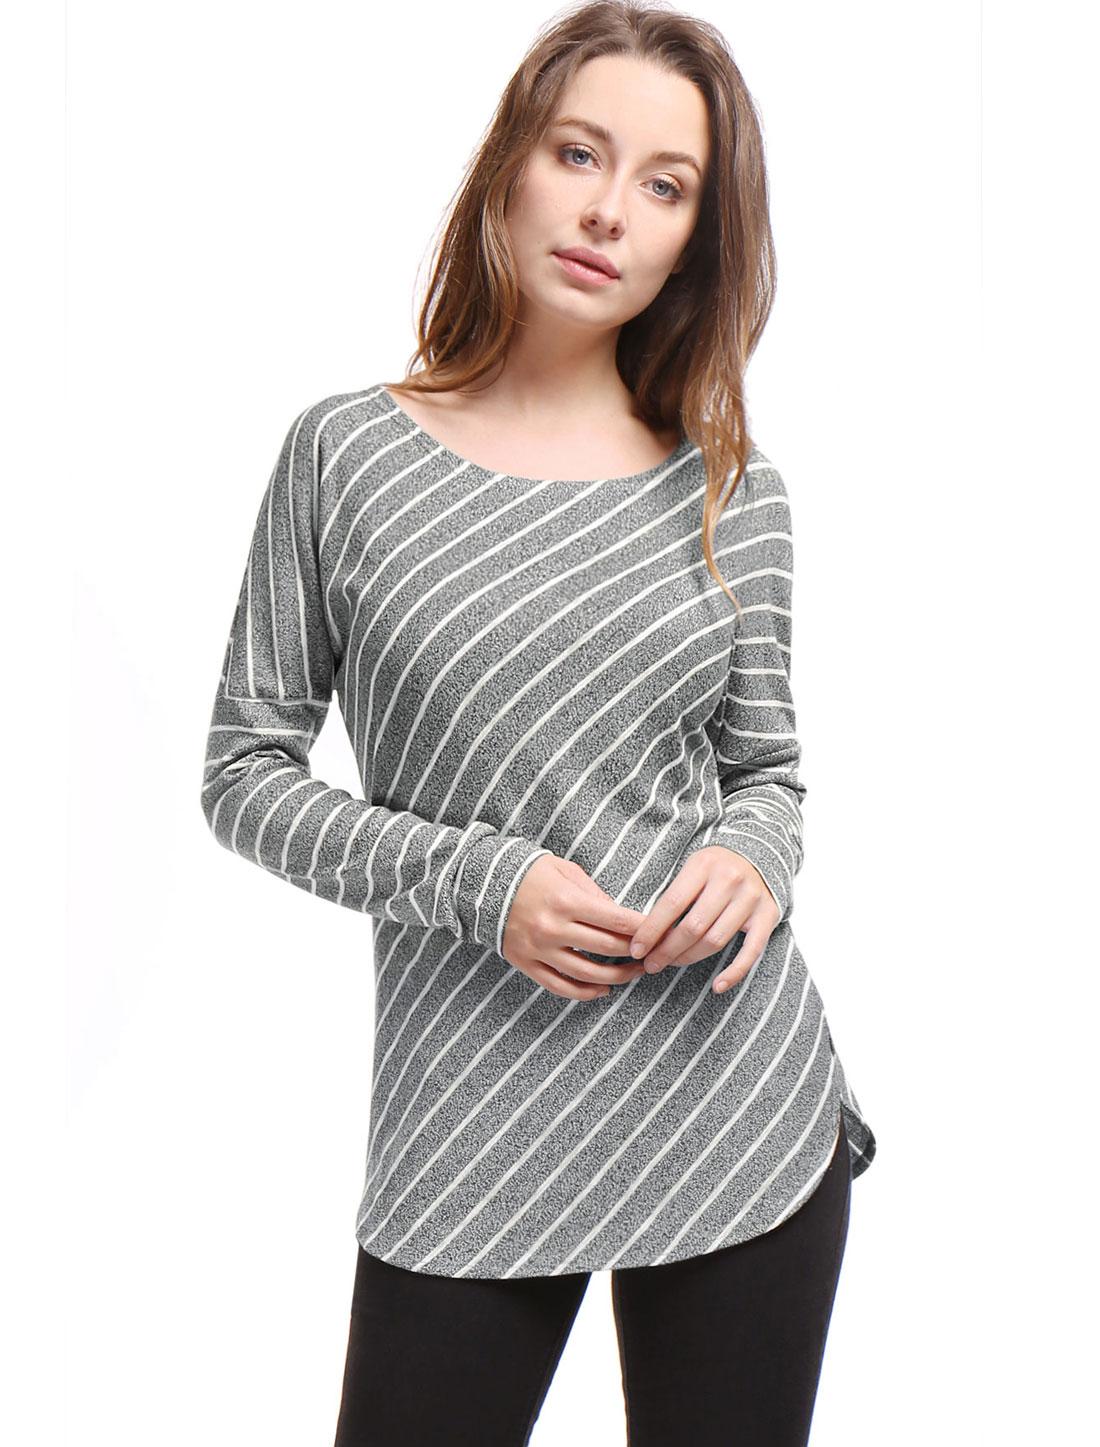 Women Stripes Scoop Neck Long Drop Sleeves Top Gray XL